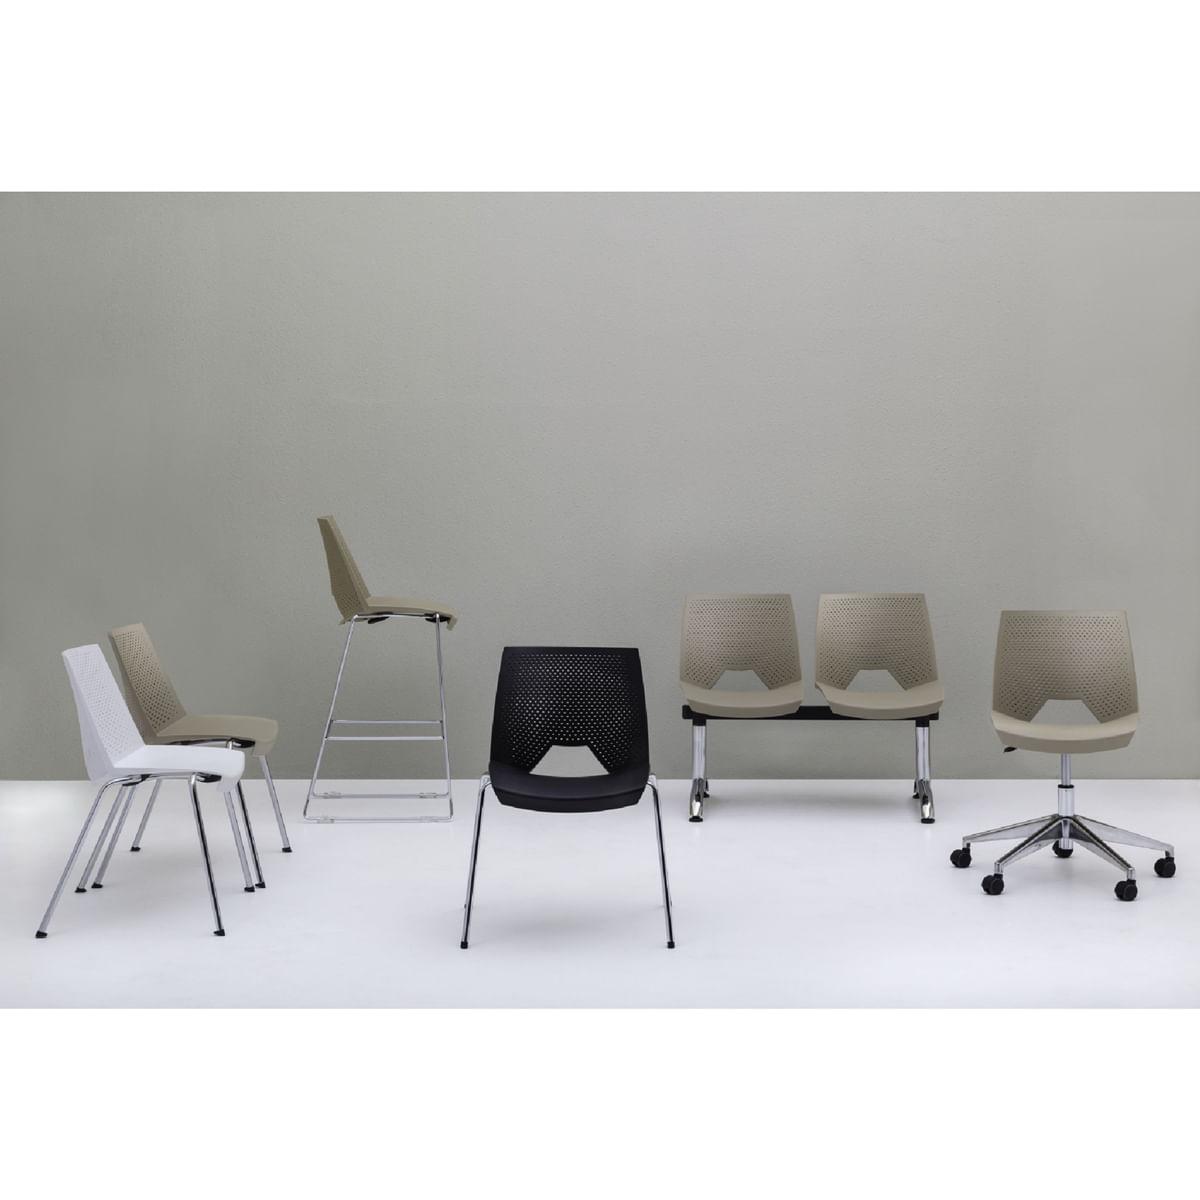 Kit 5 Cadeiras Strike Assento Vermelha Base Rodizio Preta - 57635